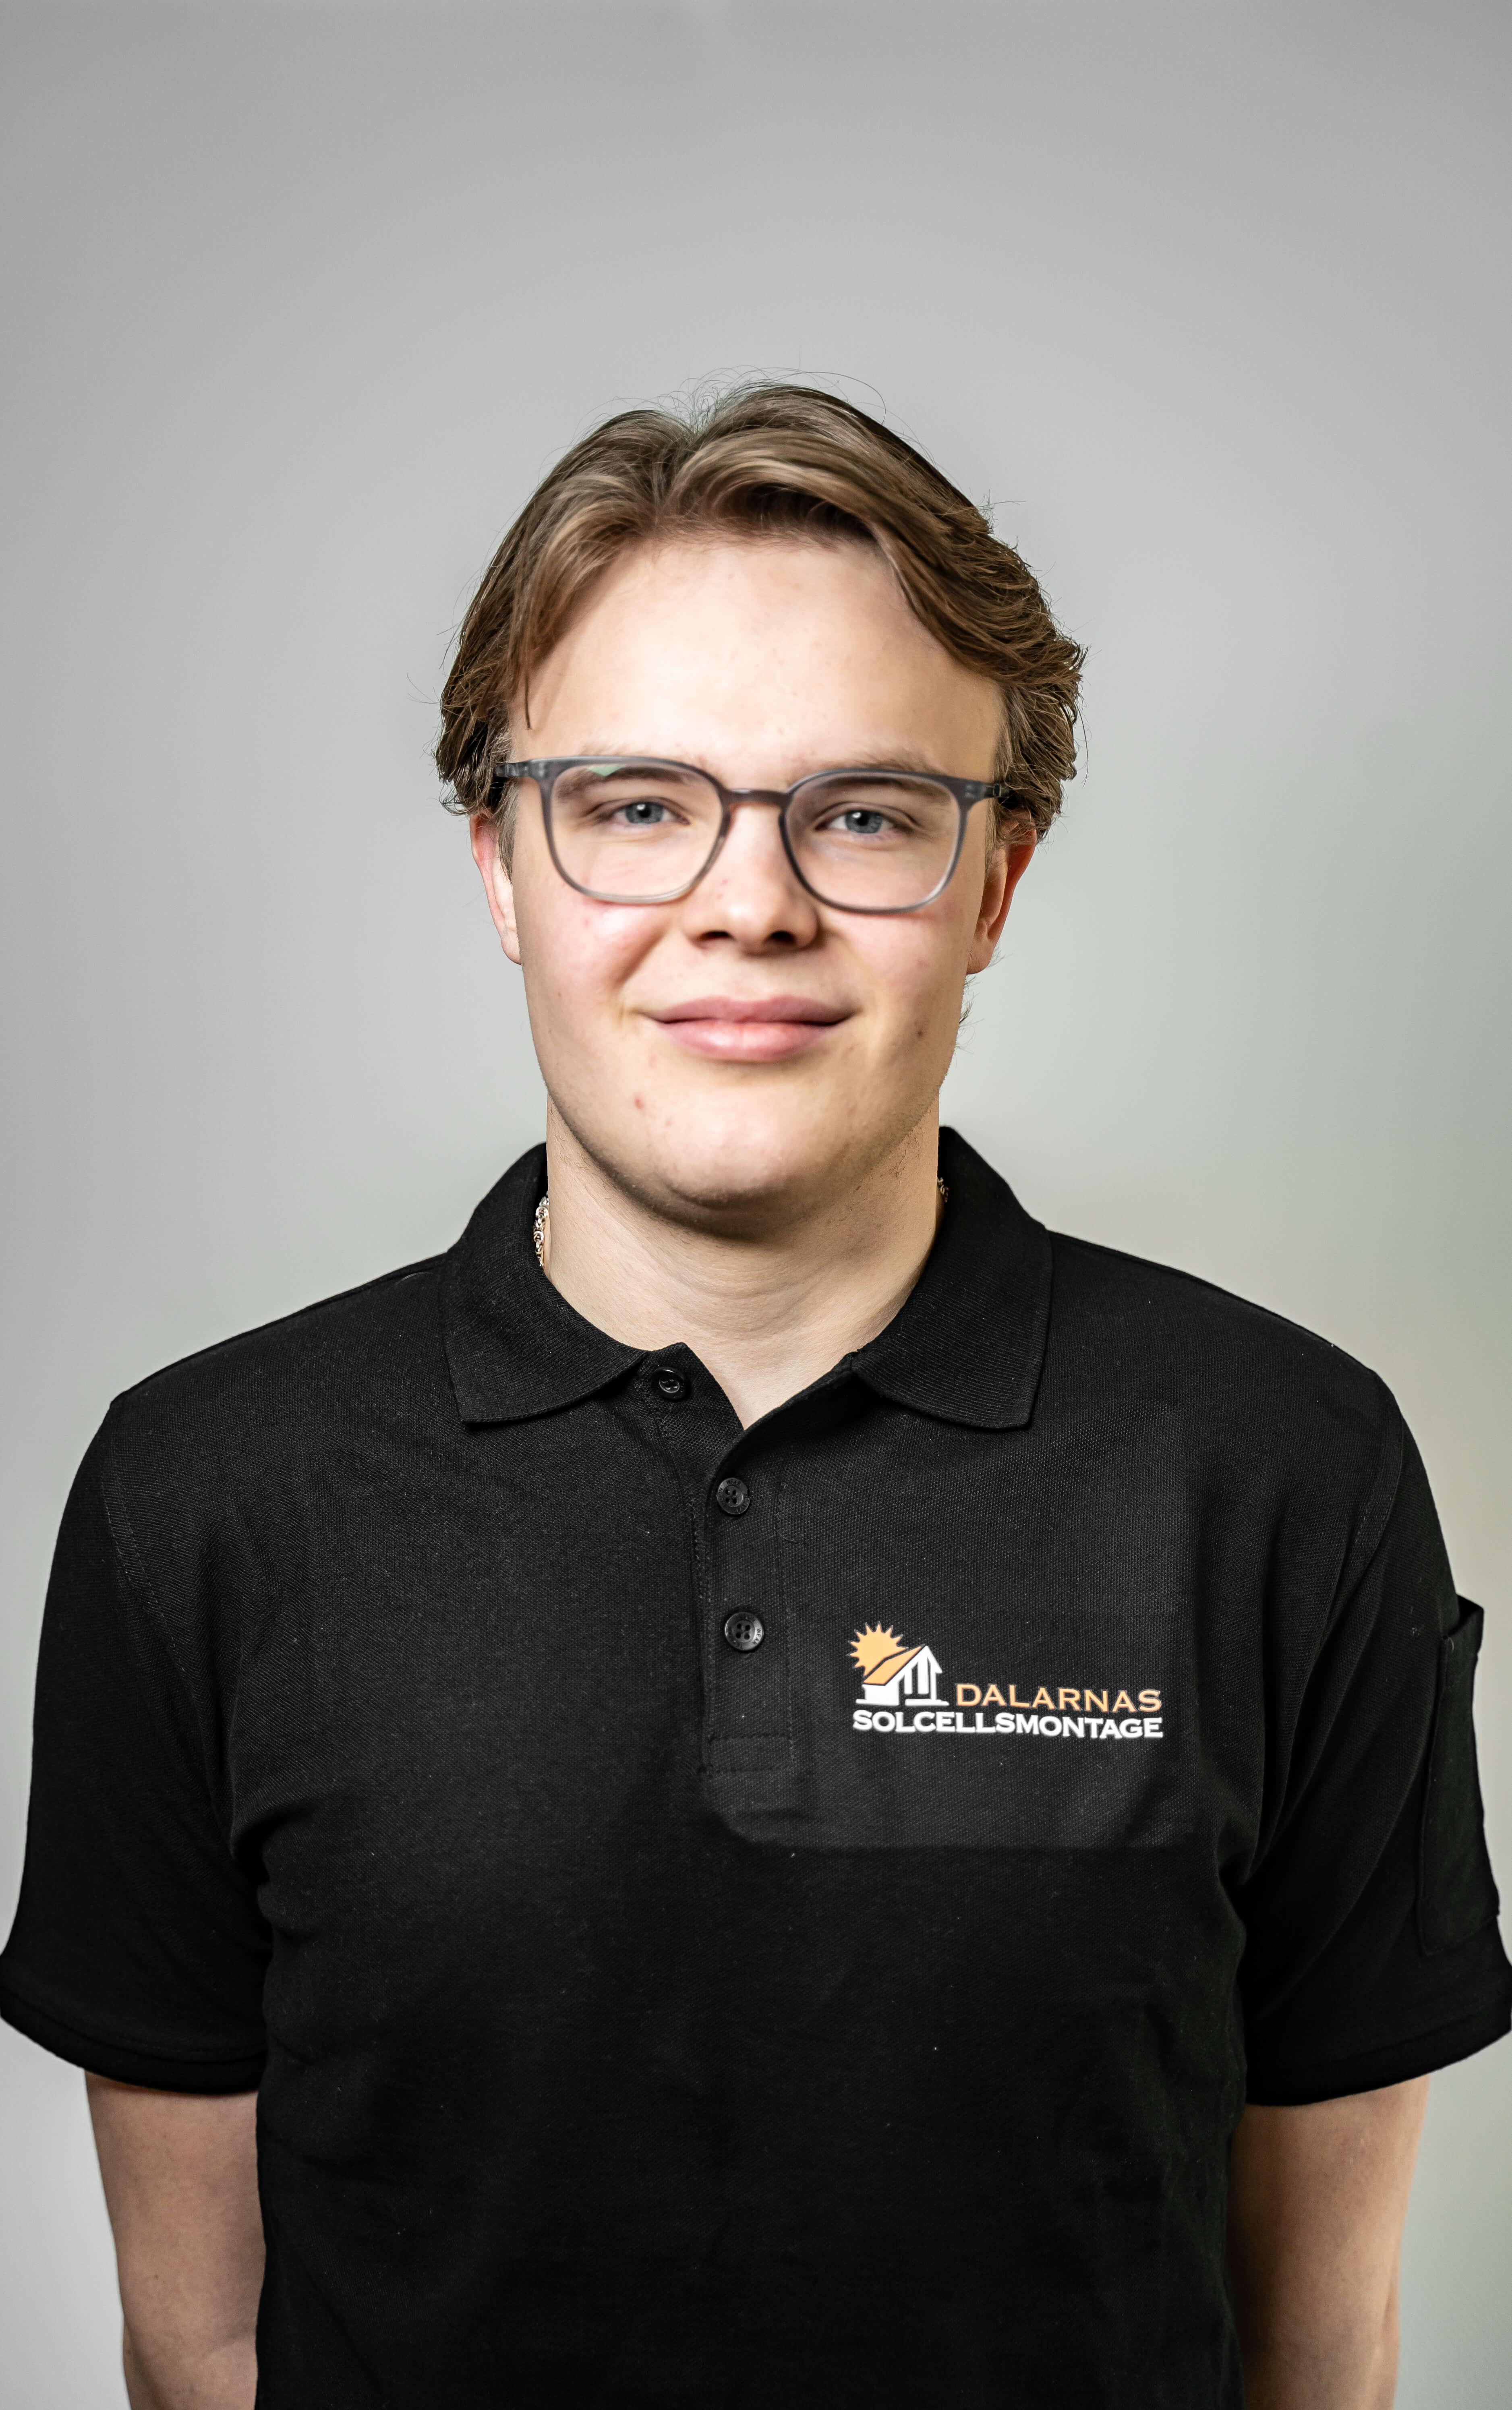 Elias Sjögren